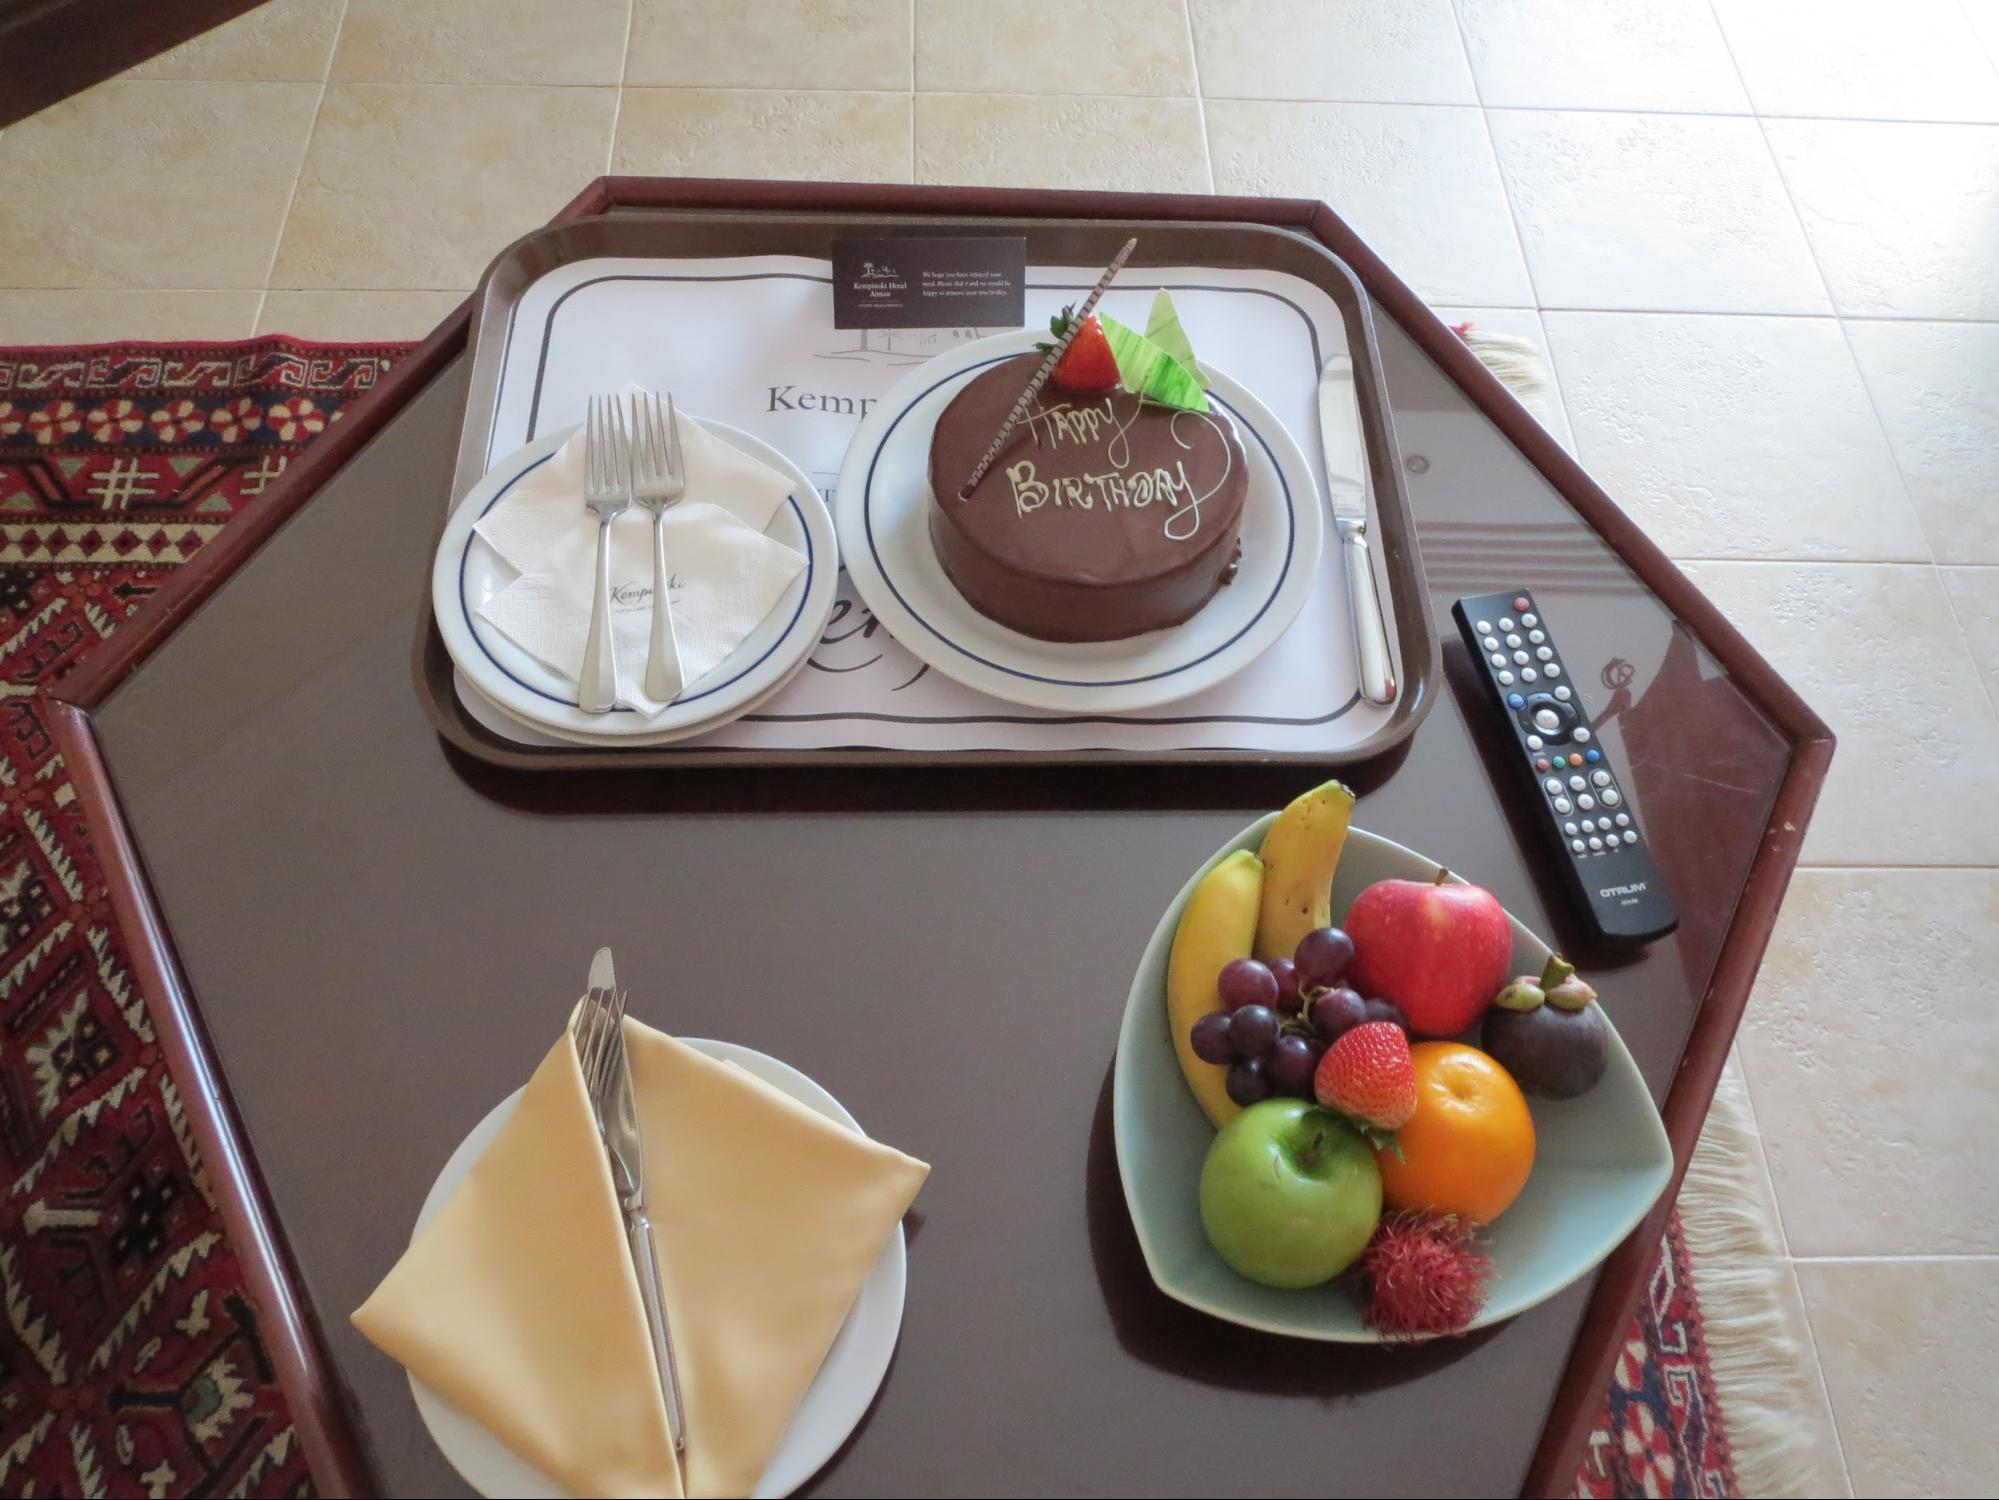 Kempinski Hotel, Ajman Review - Special Birthday Surprise Chocolate Cake